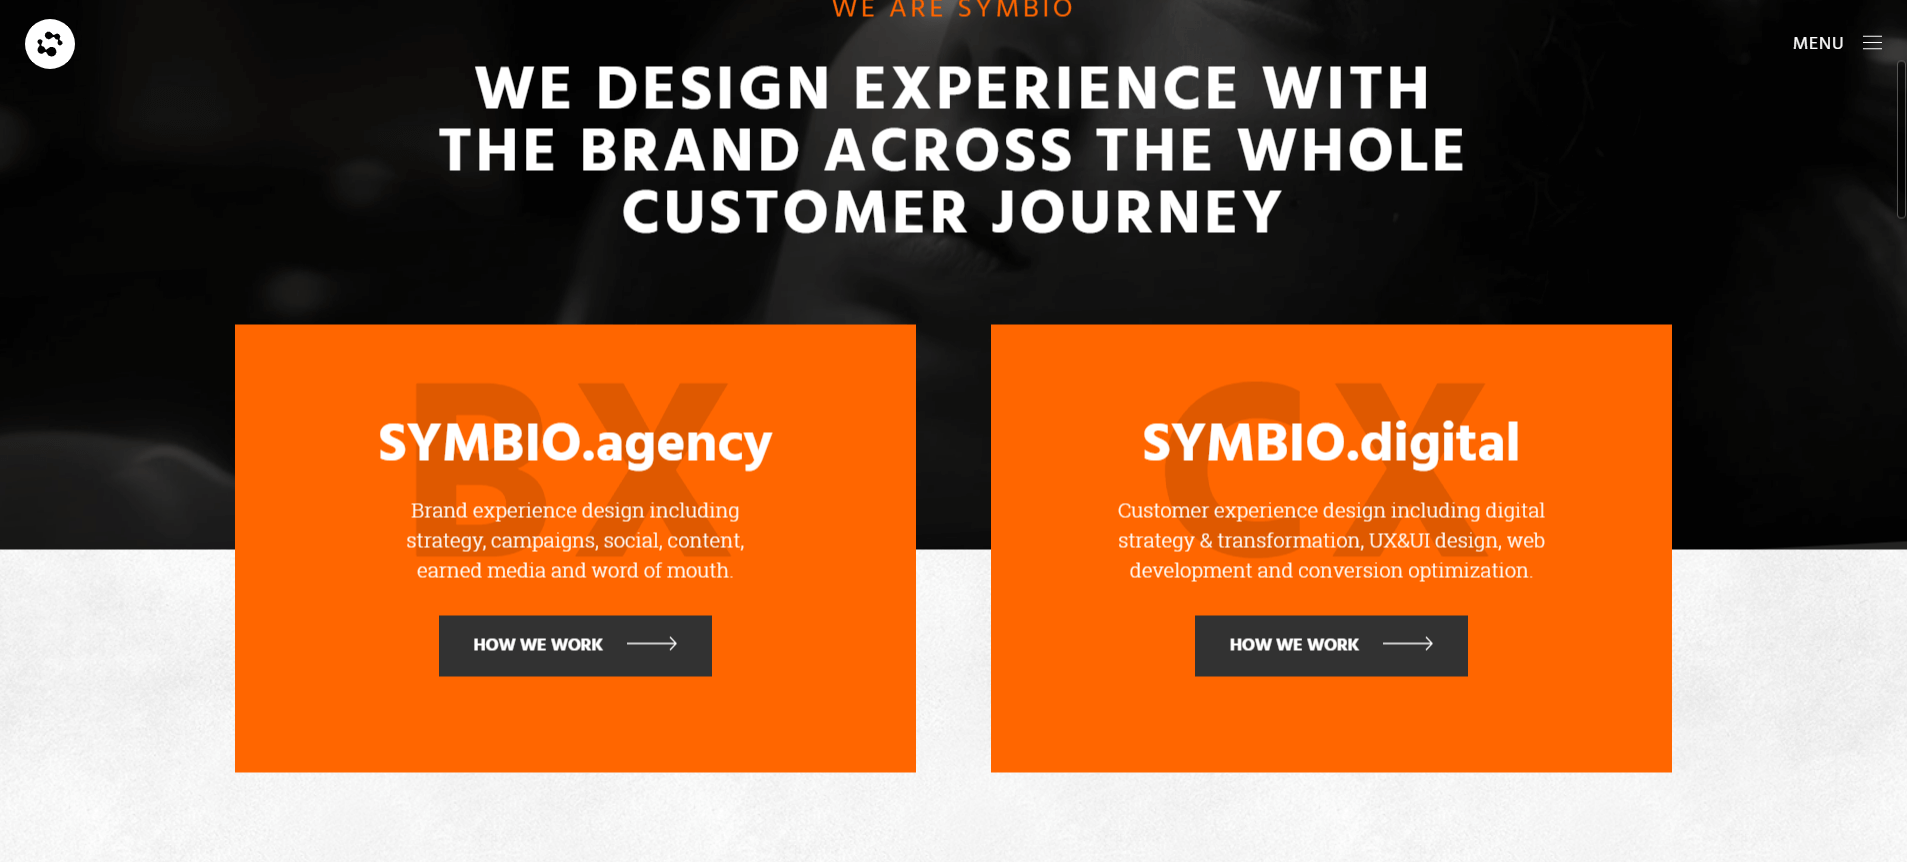 Creative Hotel Website Designs for Inspiration_2